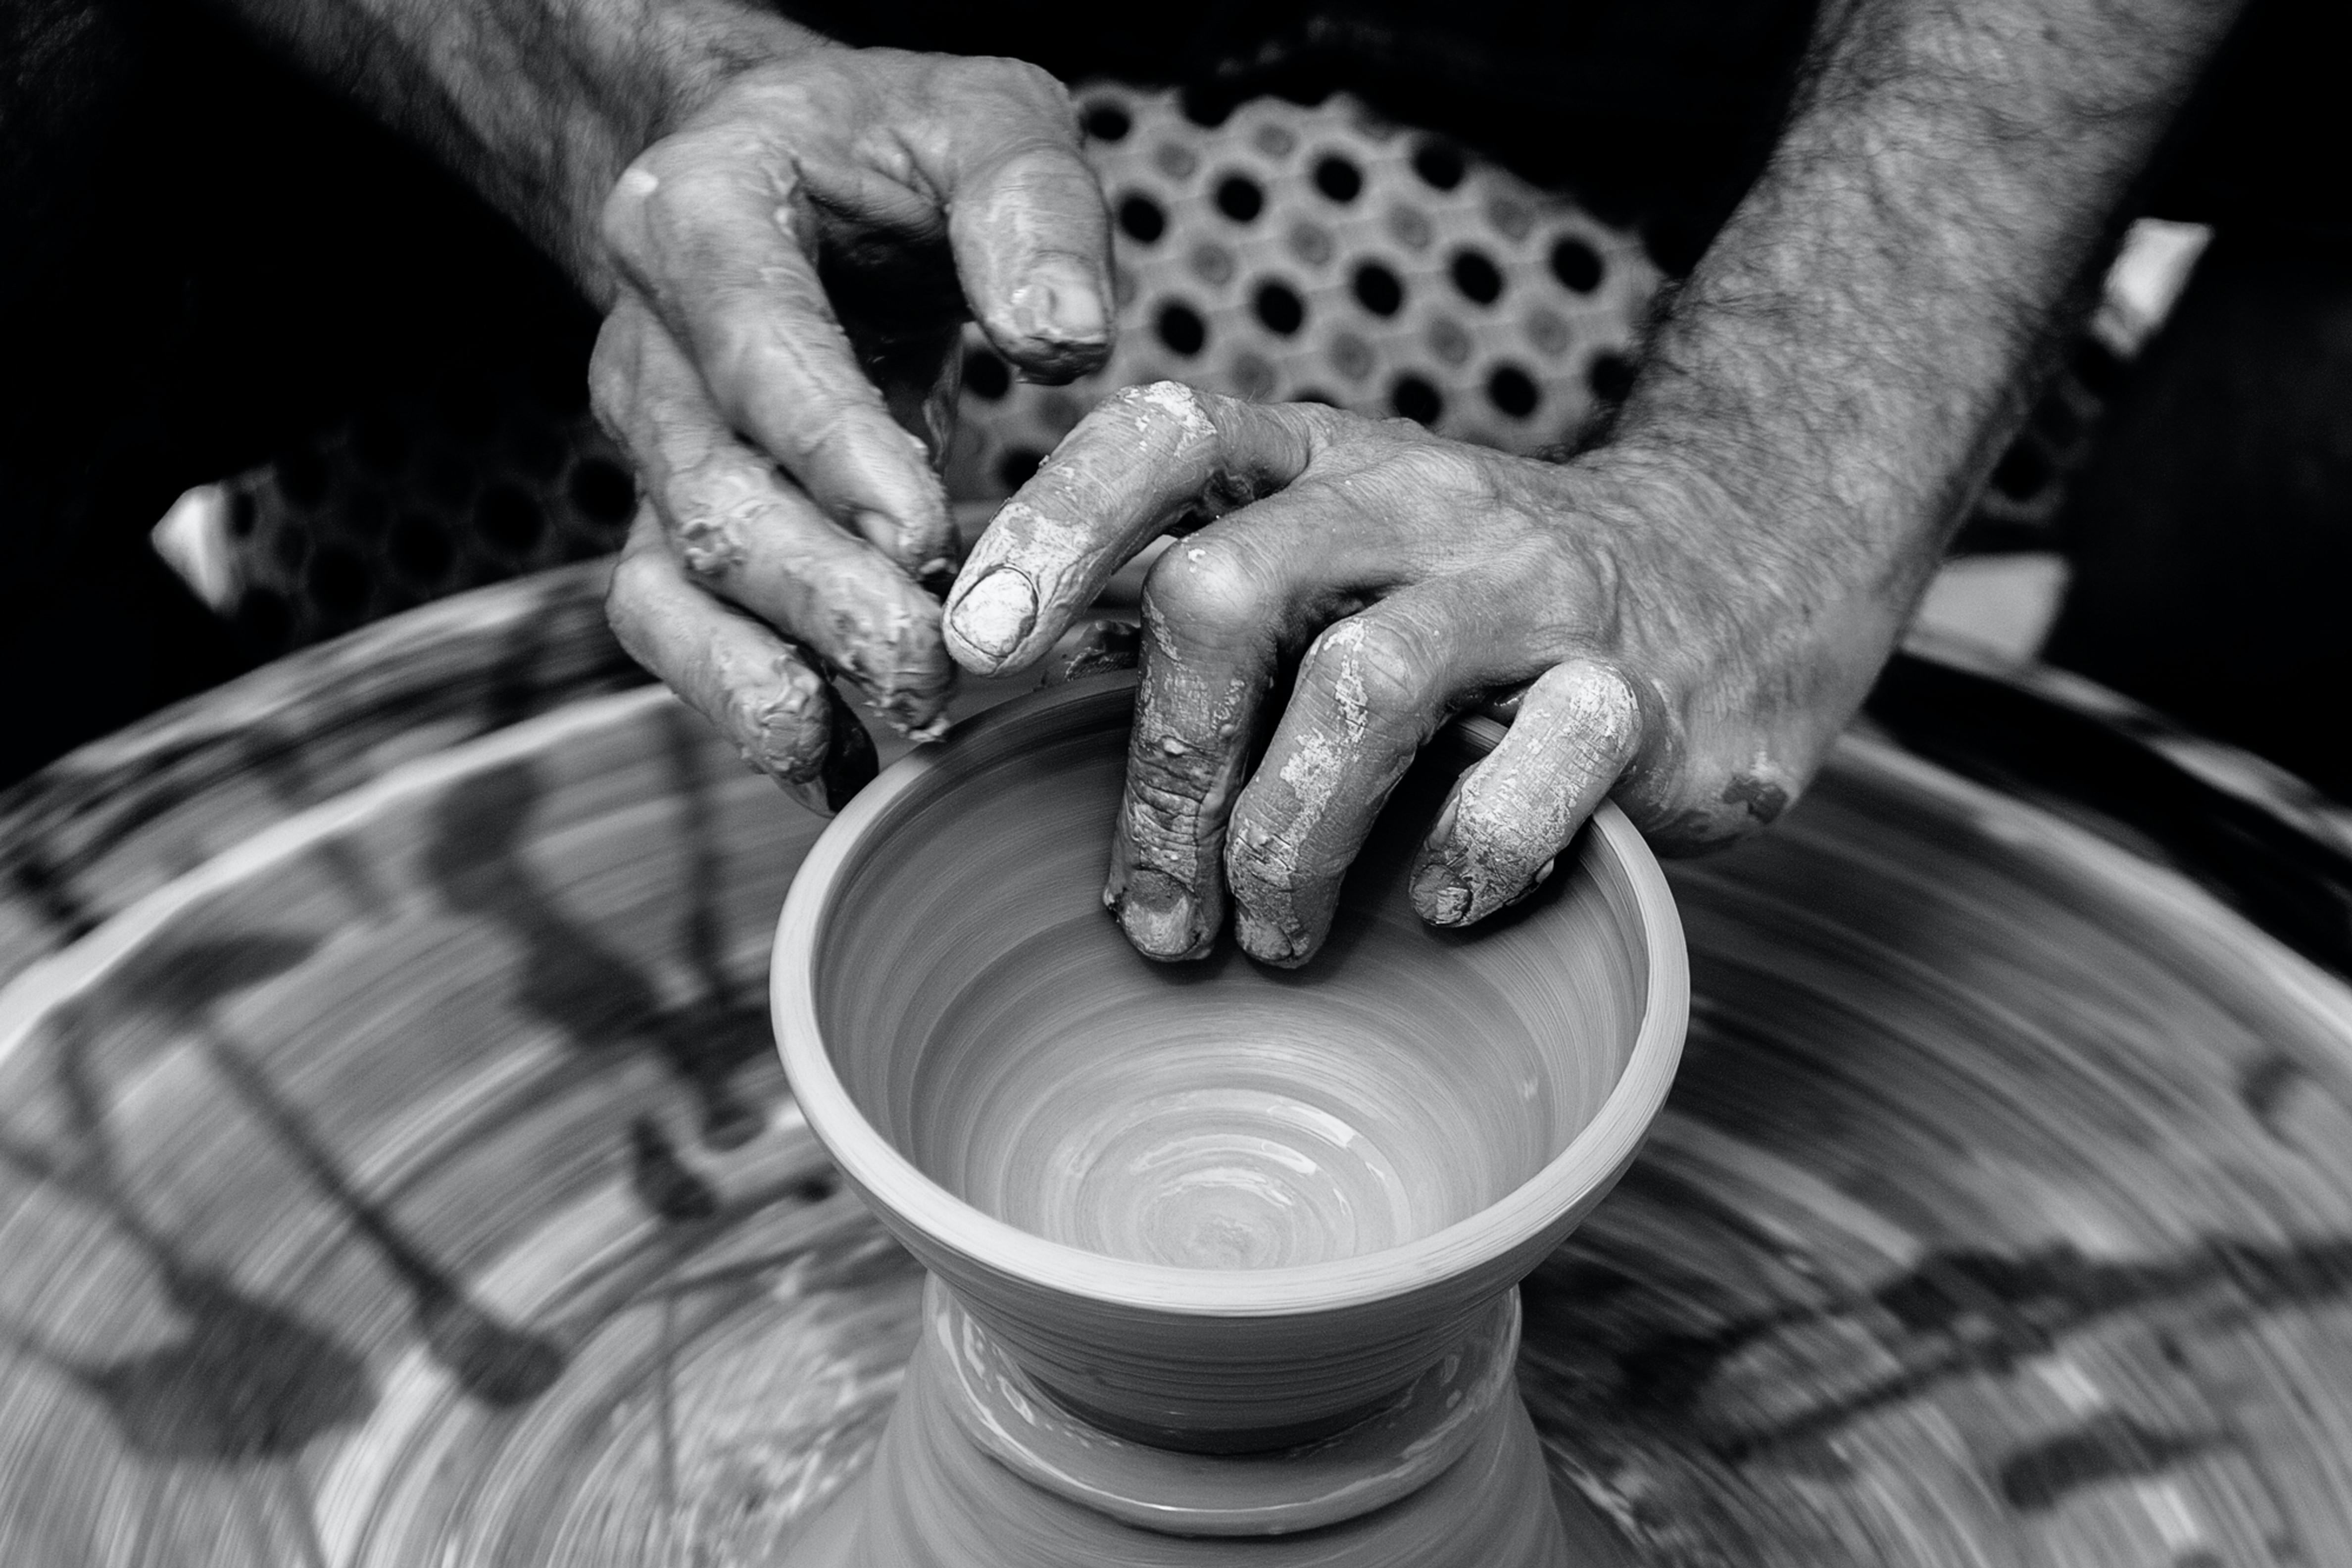 Beginners pottery course - Batch B